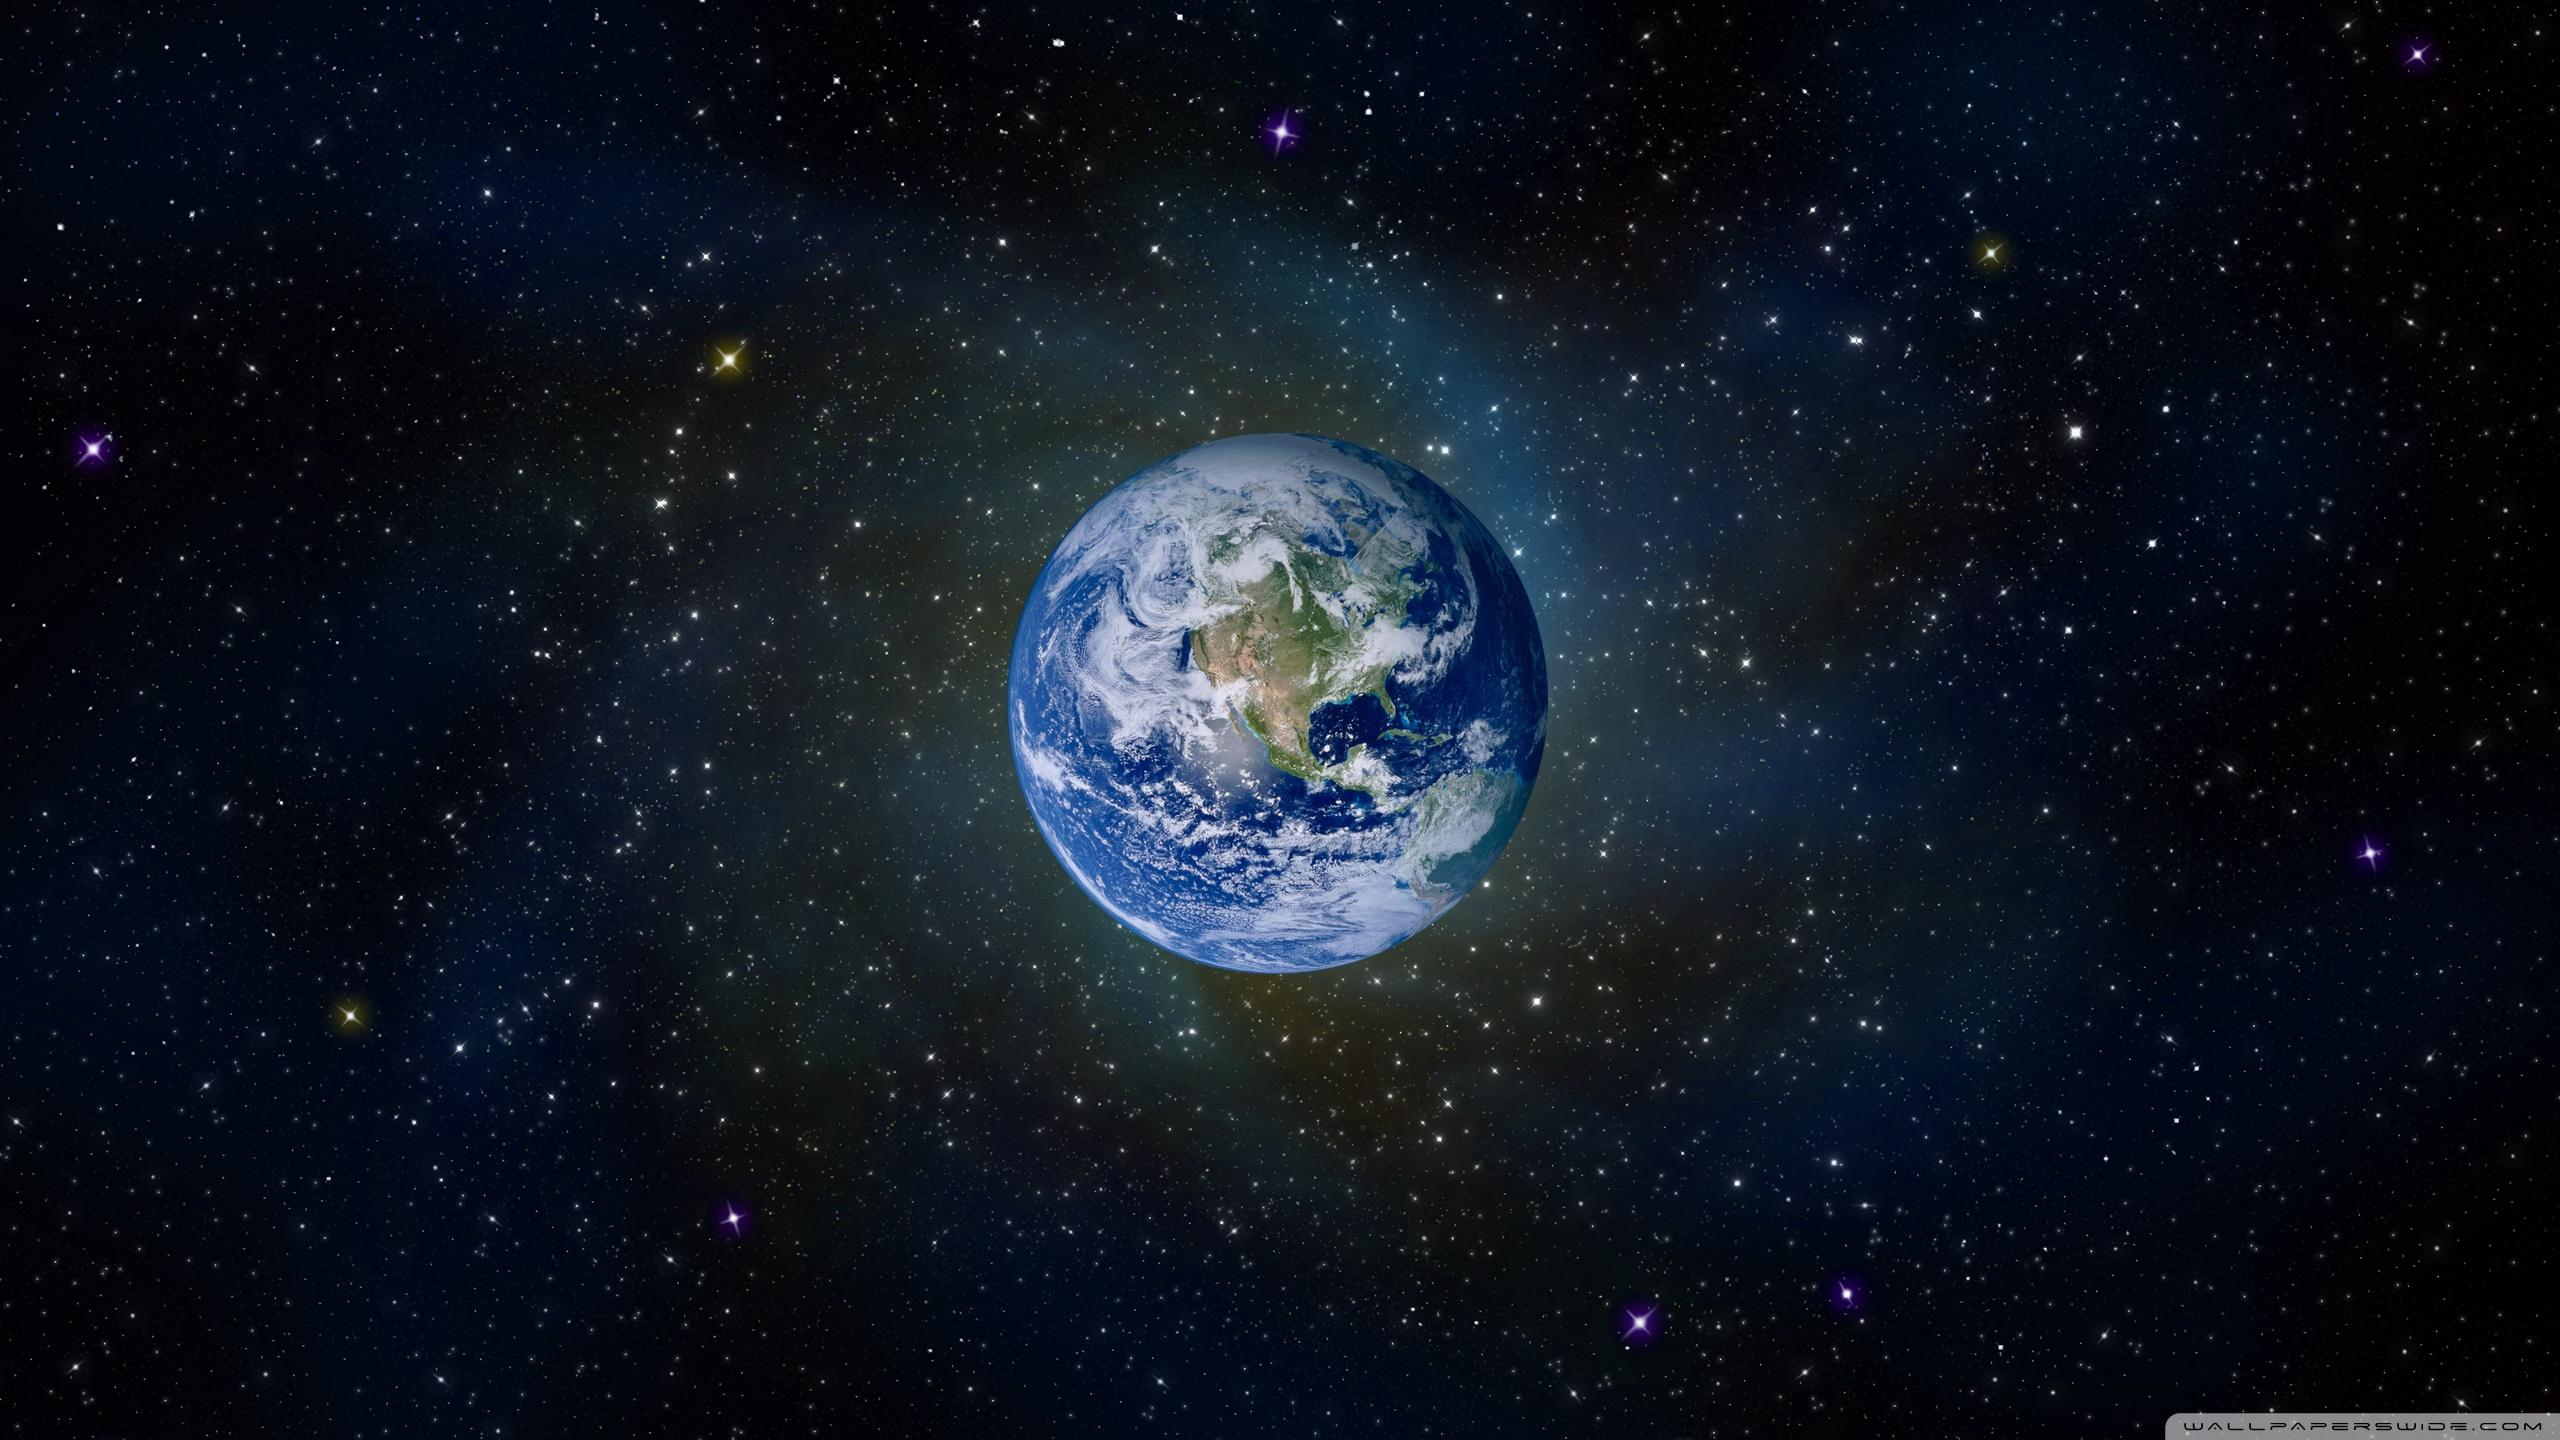 Space Universe Eclipse Hd Wallpapers Desktop: 바탕화면/아이콘 자료실